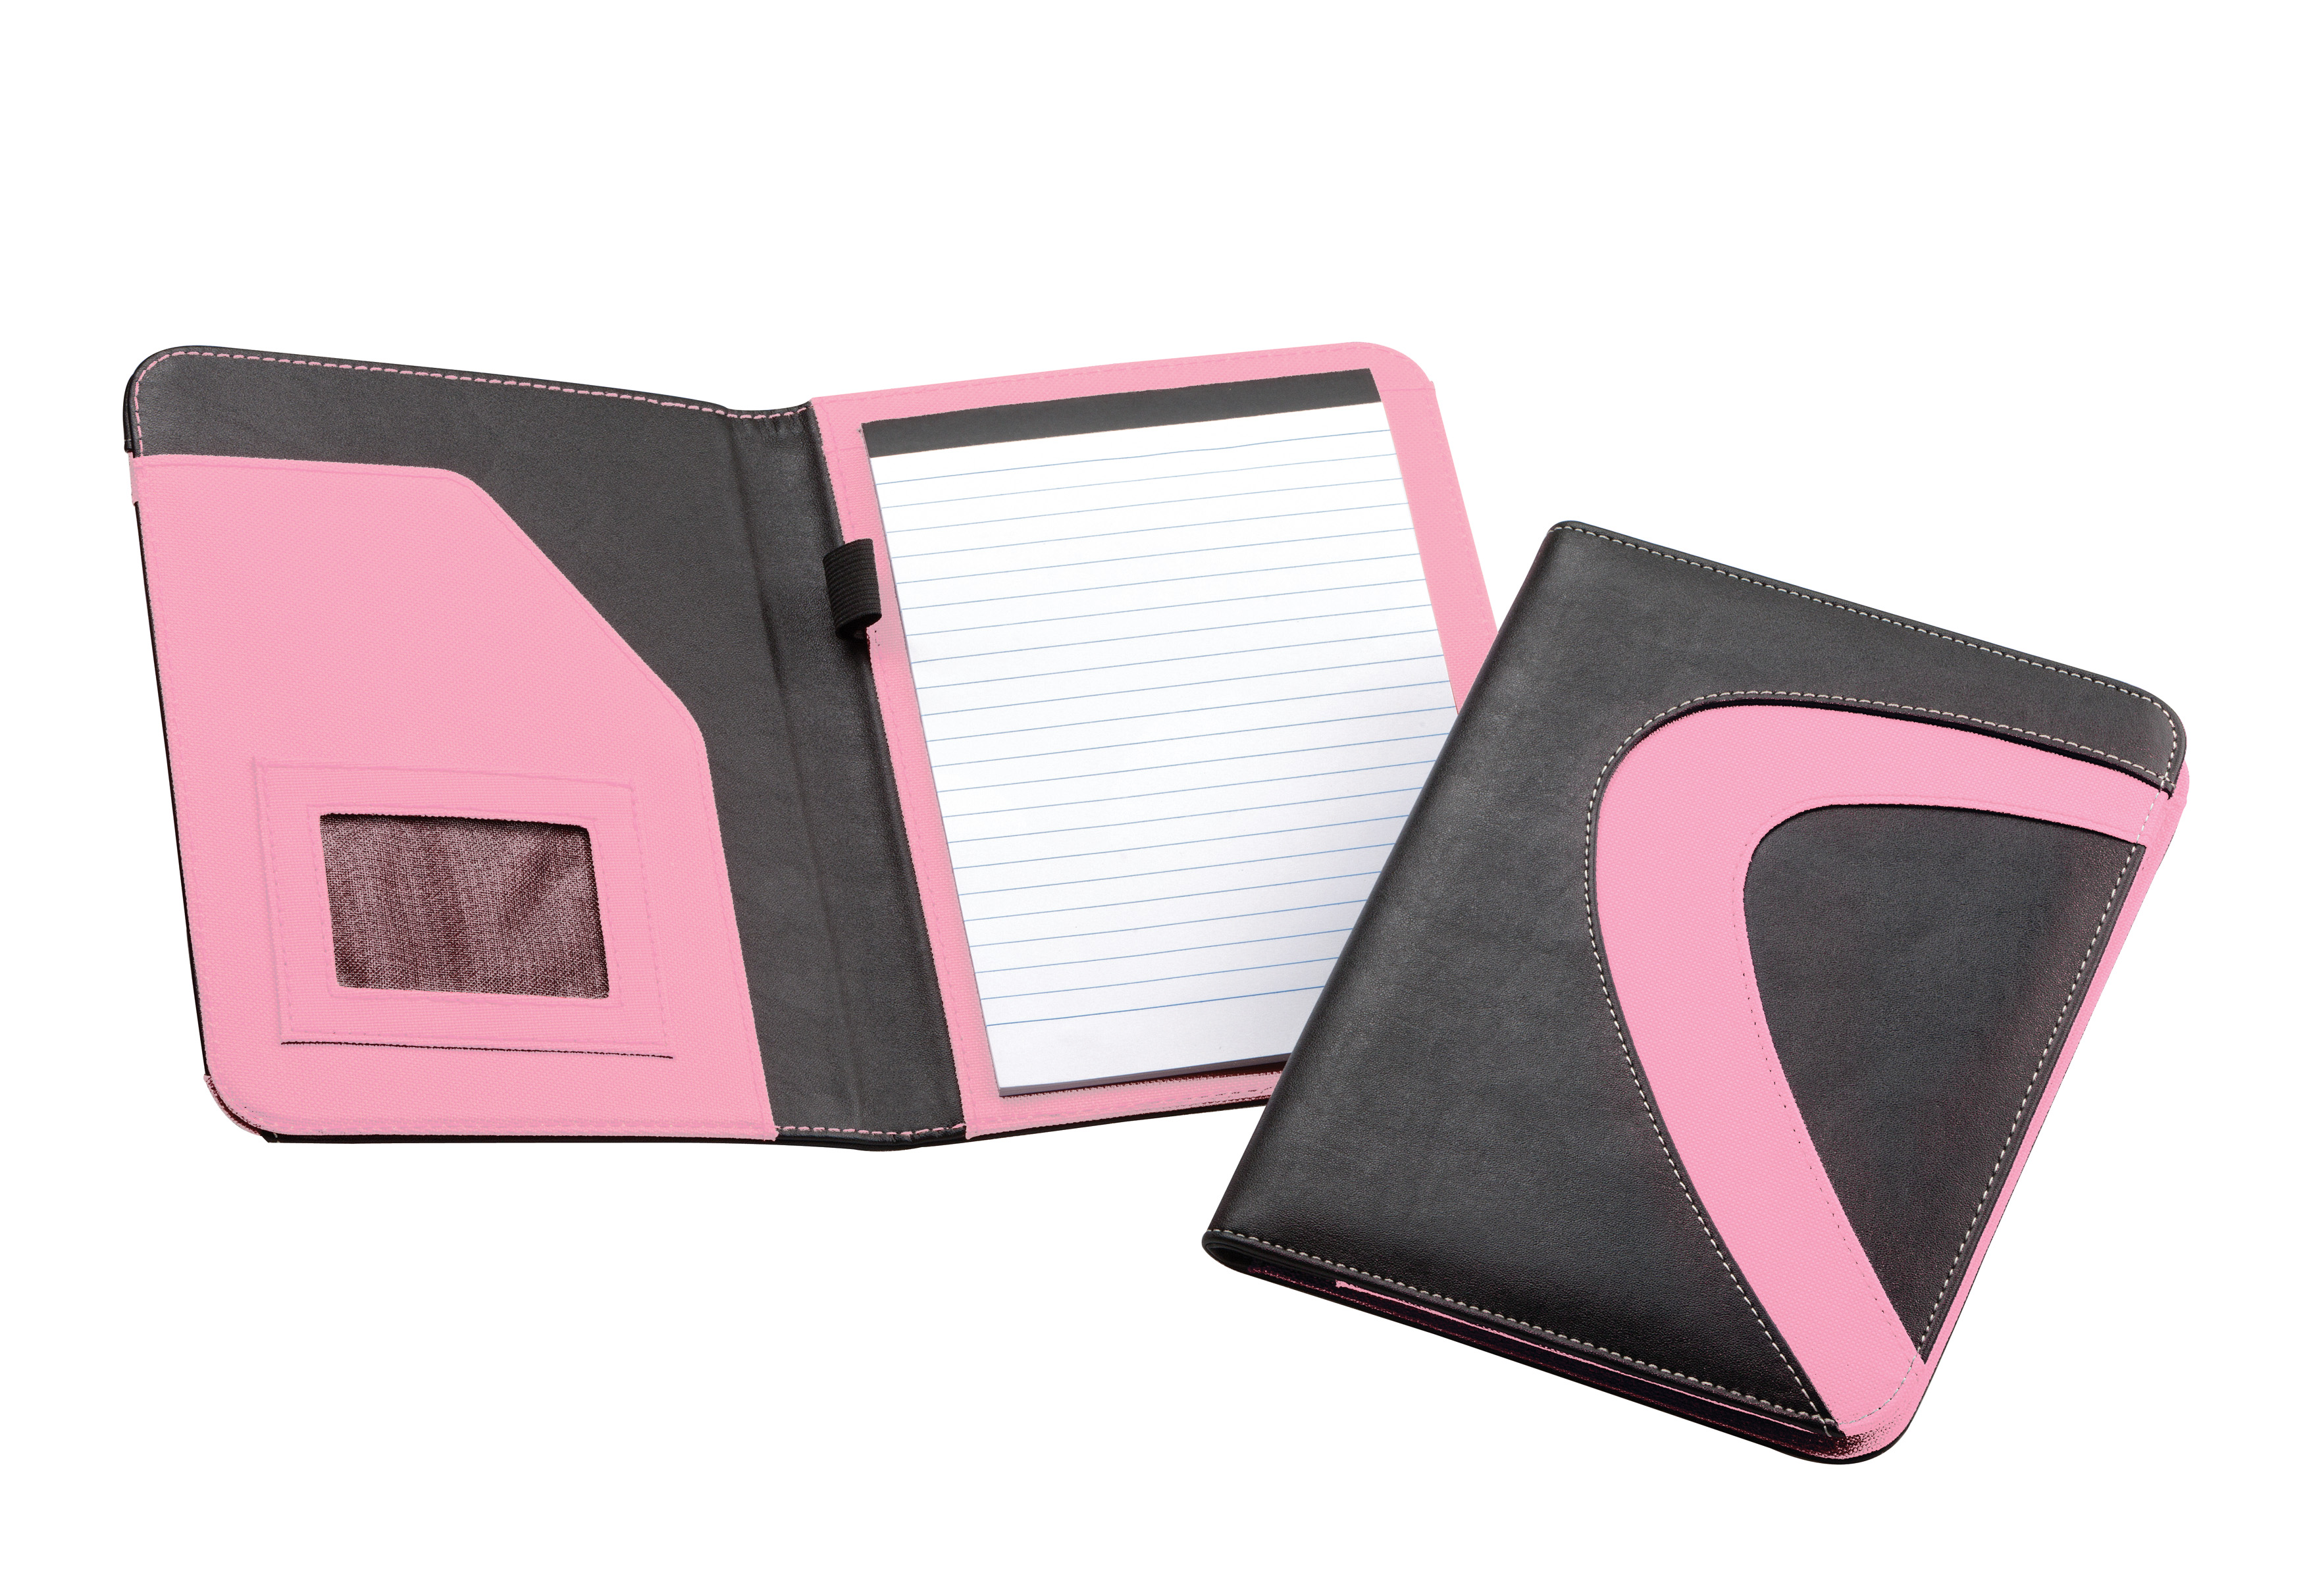 A5 Swoosh Folder Product Image